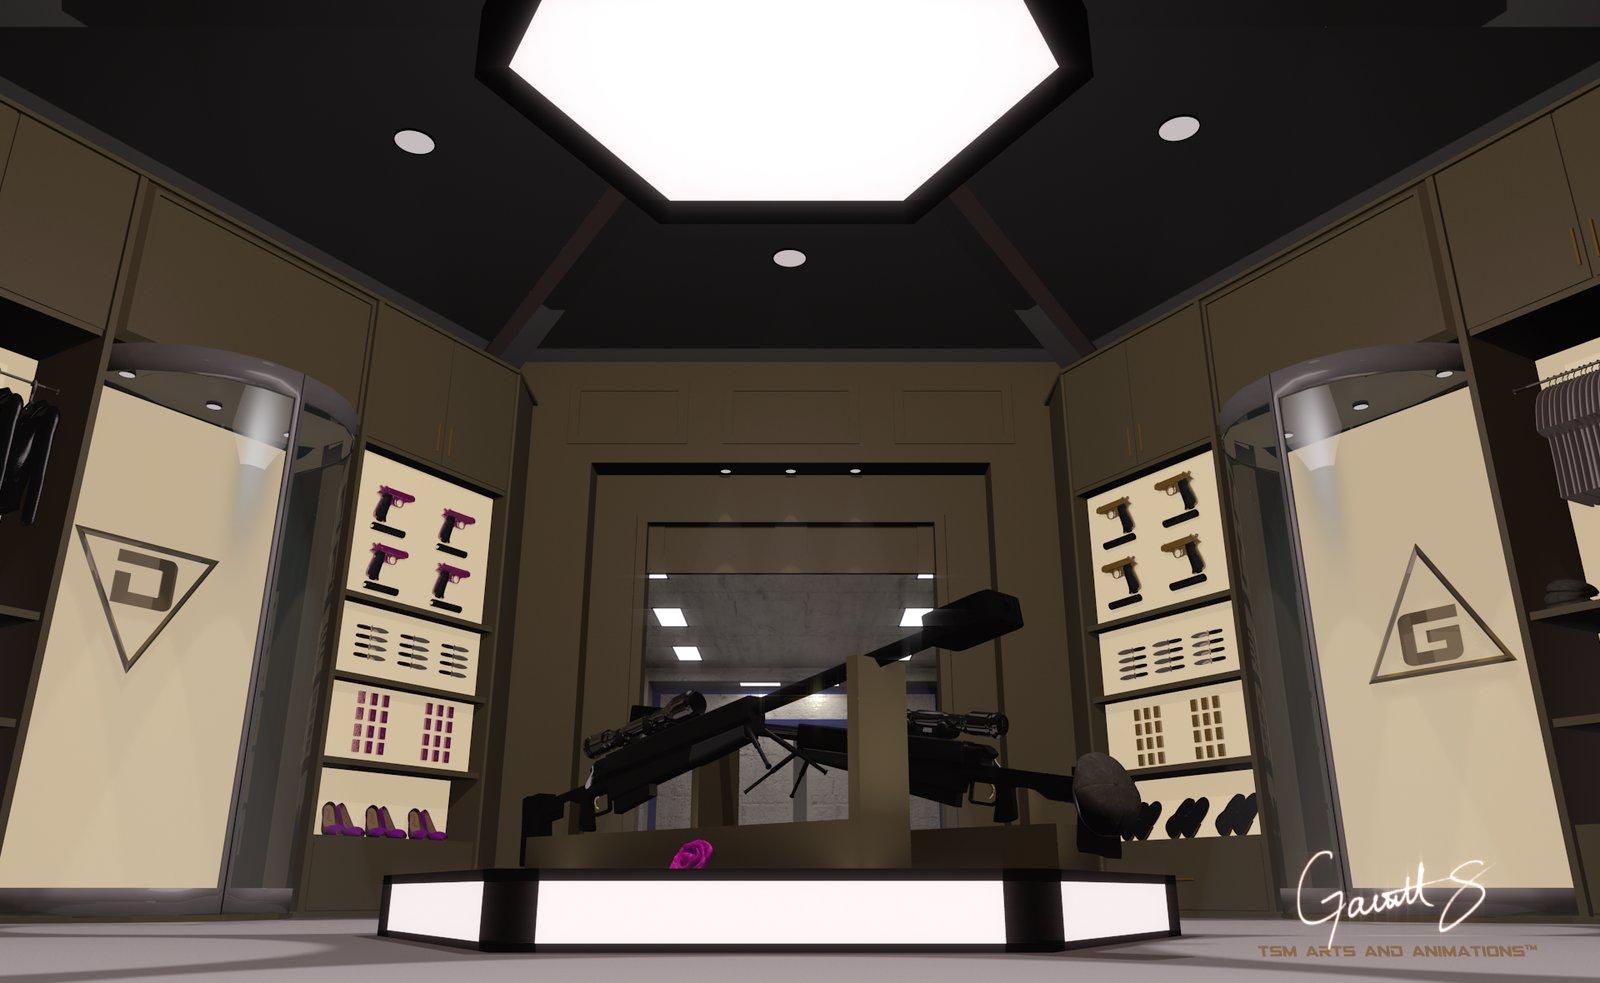 Mr. G (Agent G) and Daisy's (Agent D) wardrobe room design